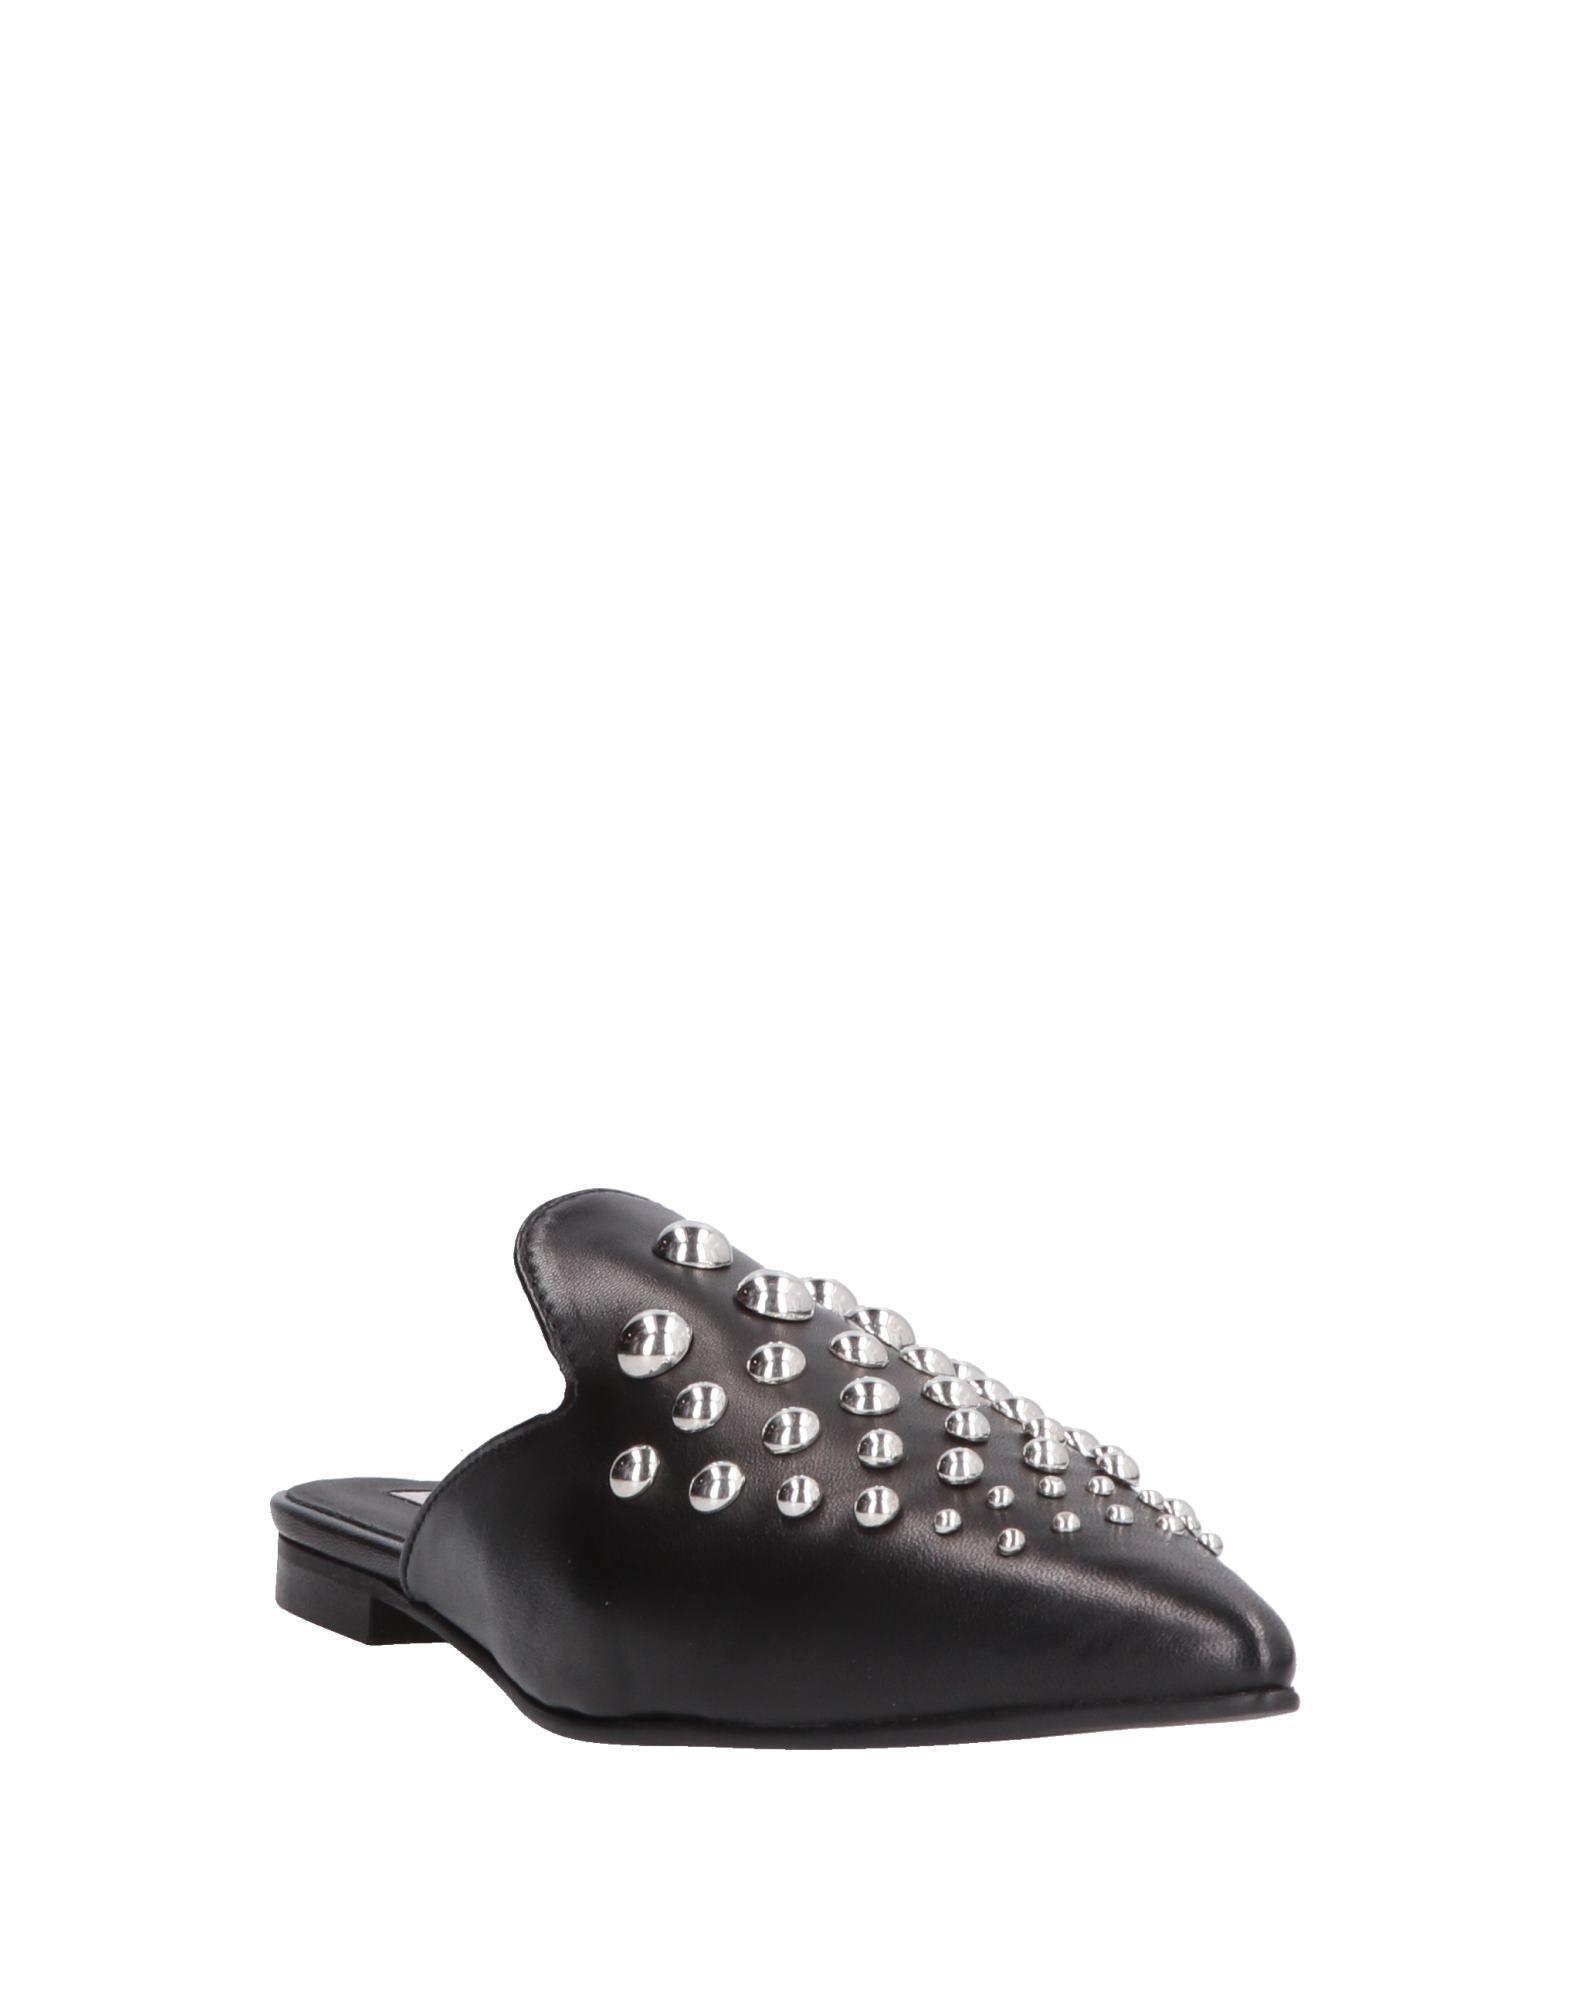 Gut um Blu billige Schuhe zu tragenTosca Blu um Schuhes Pantoletten Damen  11571749HQ 80611a